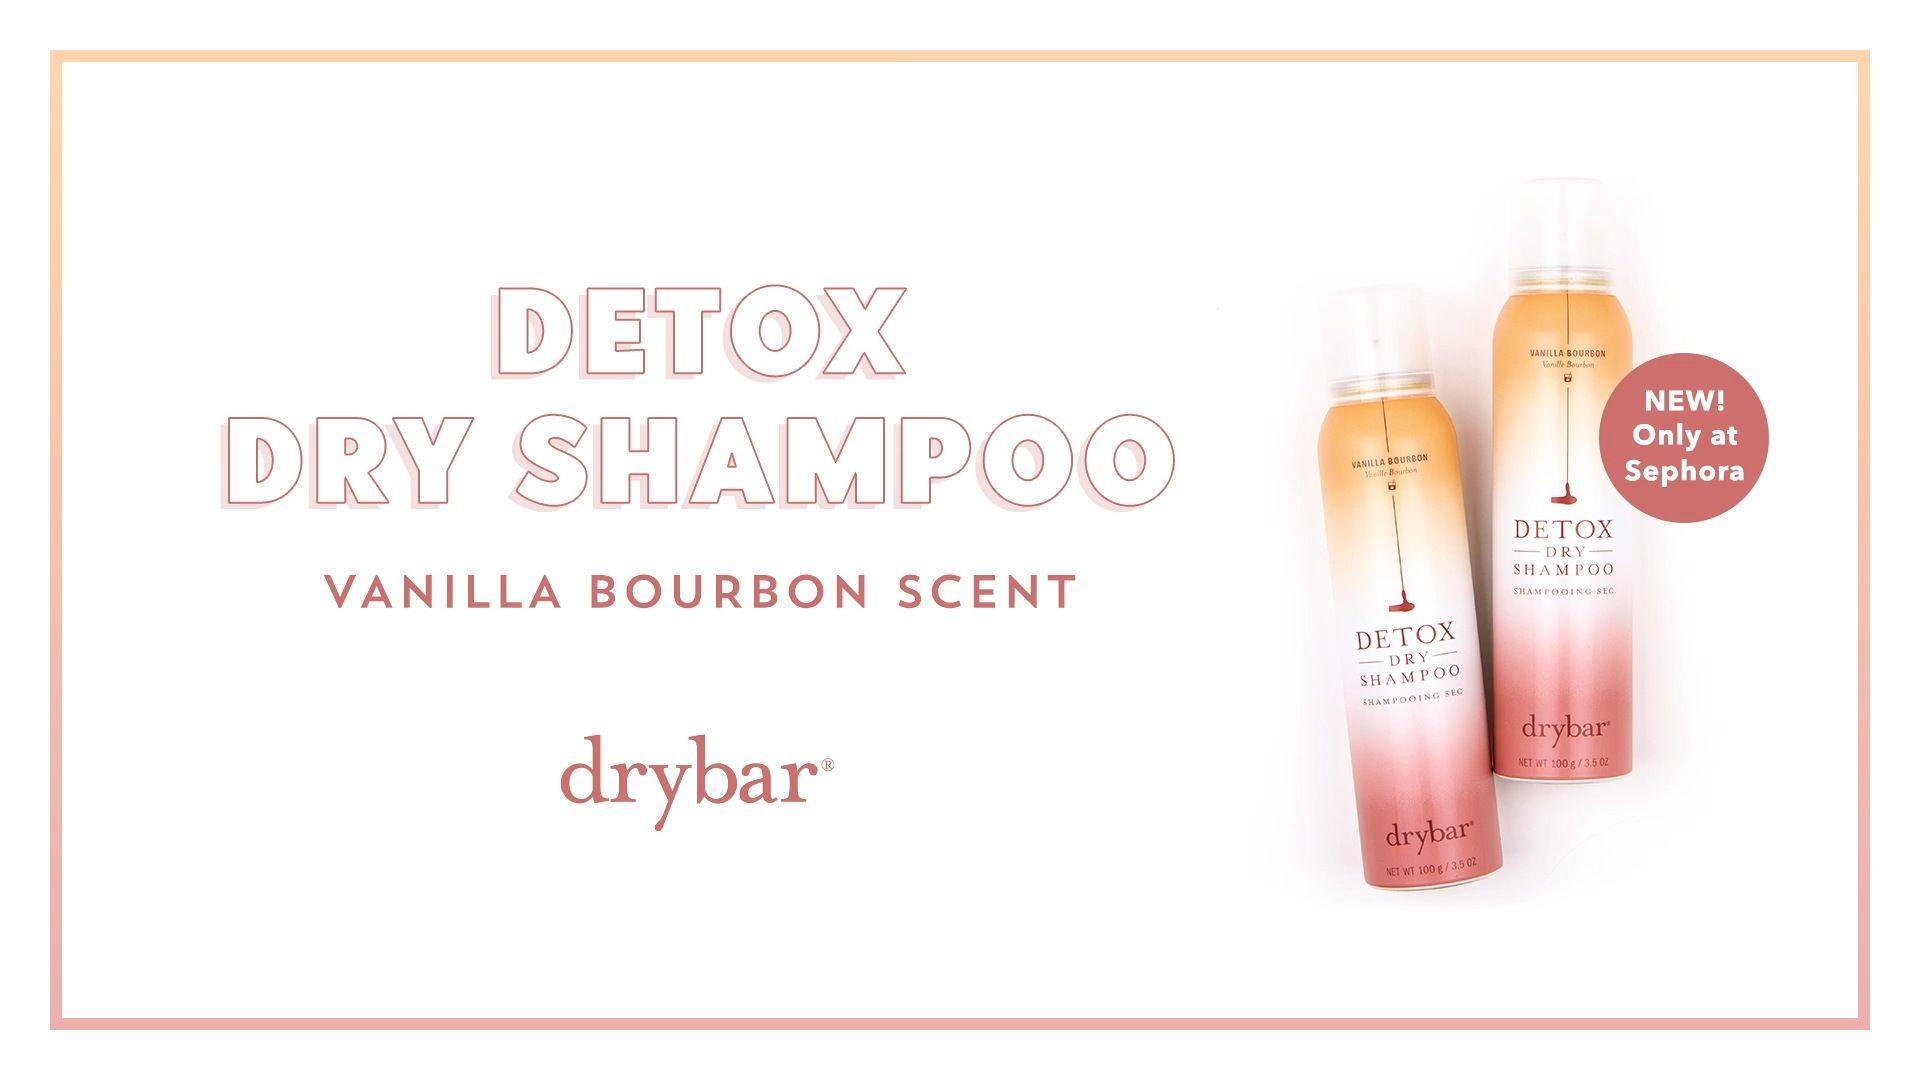 Detox Dry Shampoo Drybar Sephora Dry Shampoo Sephora Detox